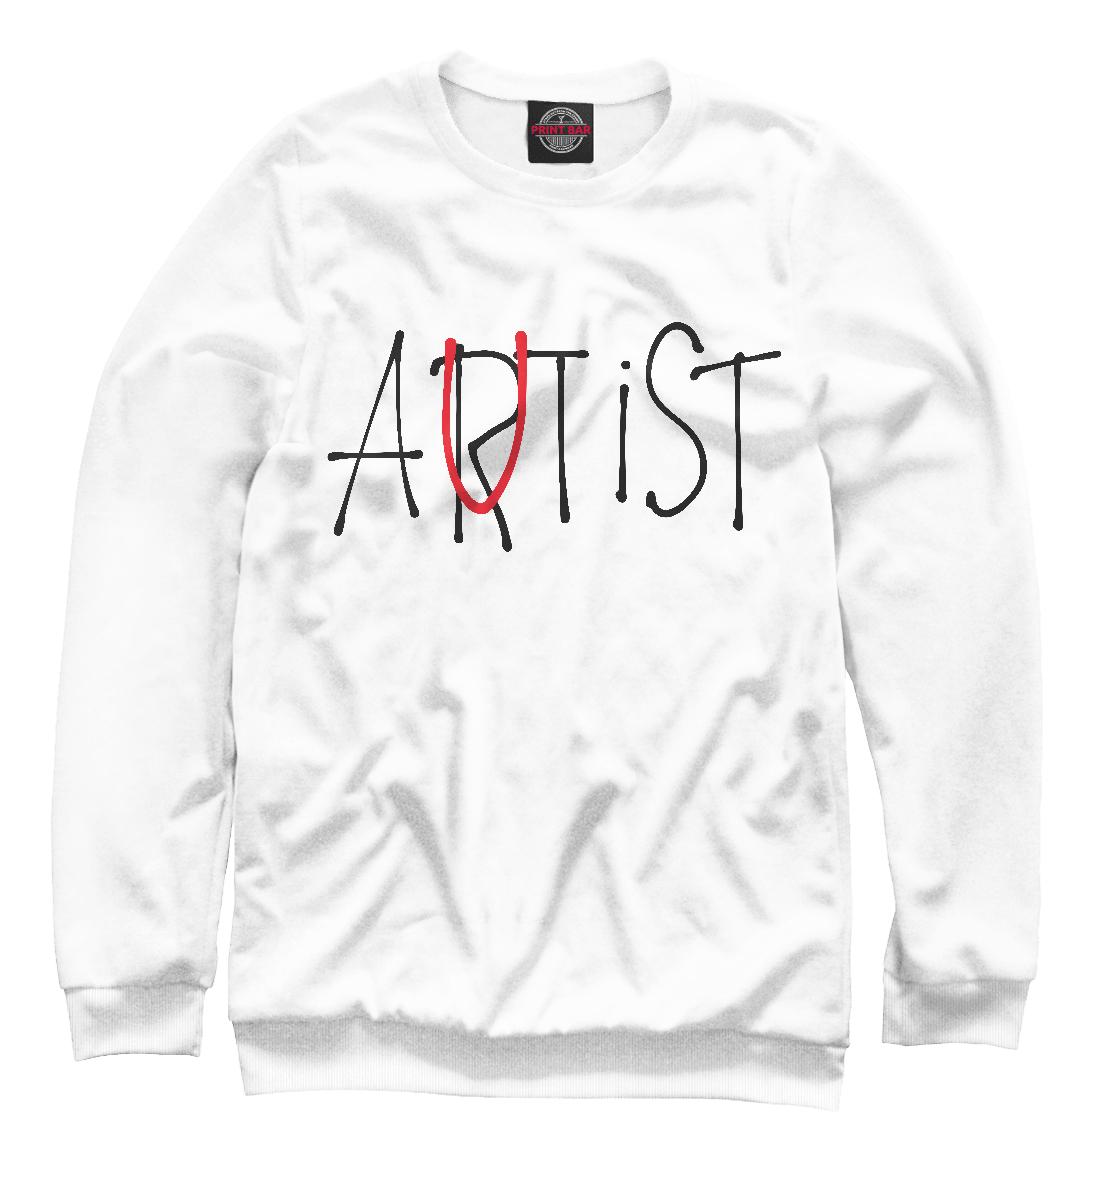 Artist / Autist оно